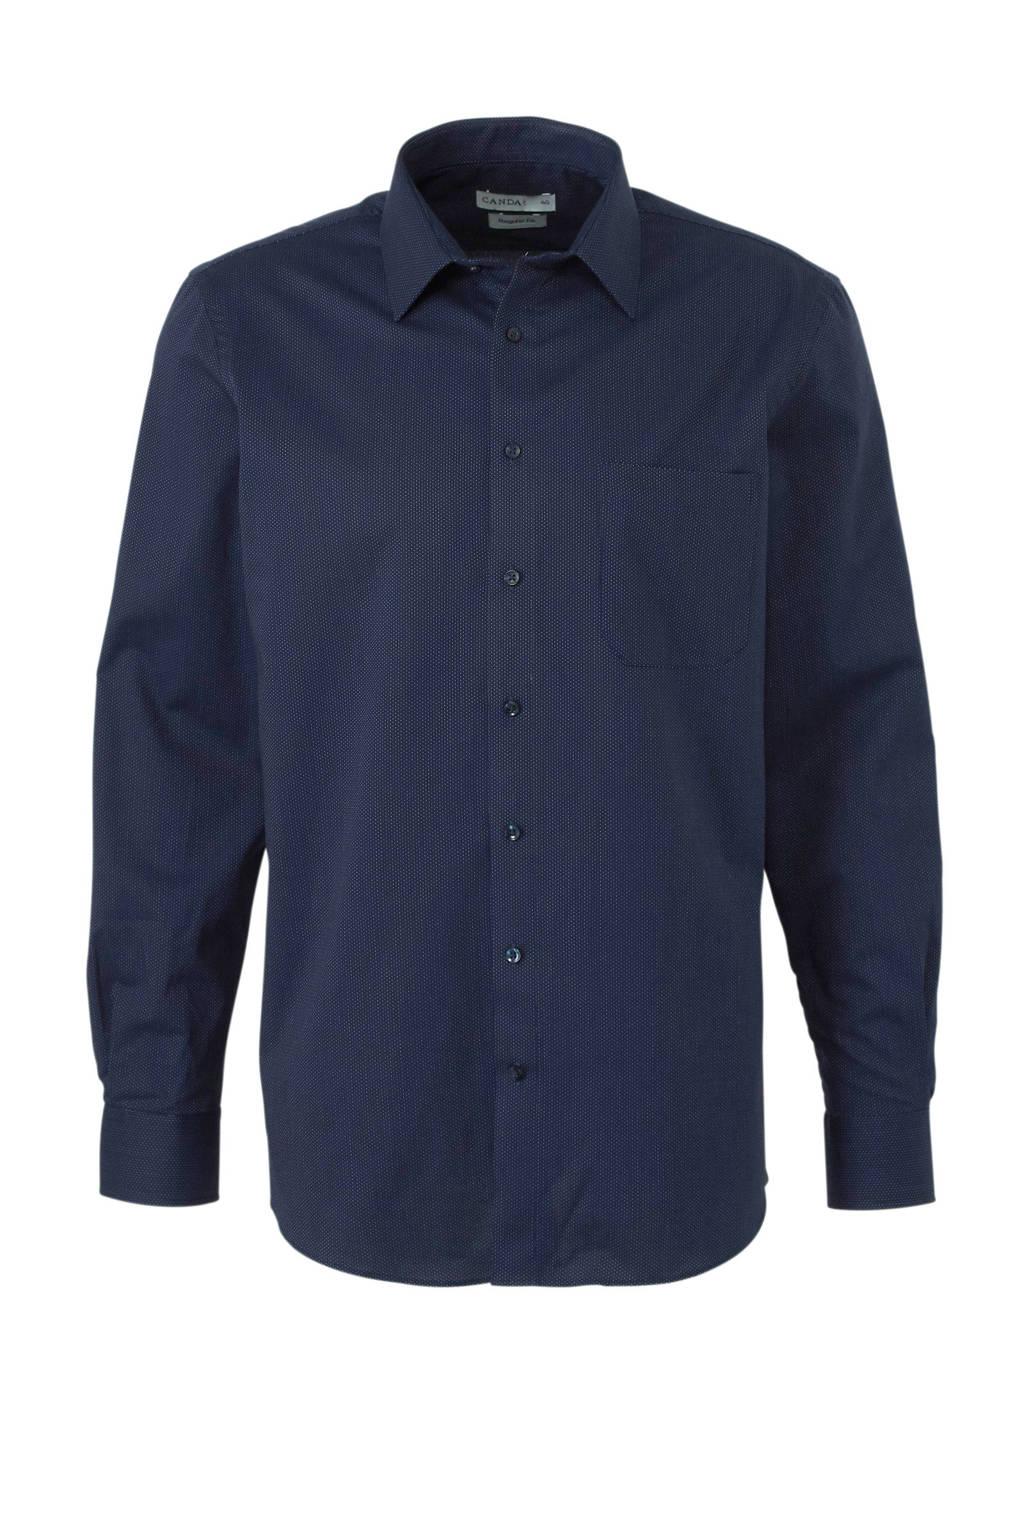 C&A Canda regular fit overhemd, Donkerblauw